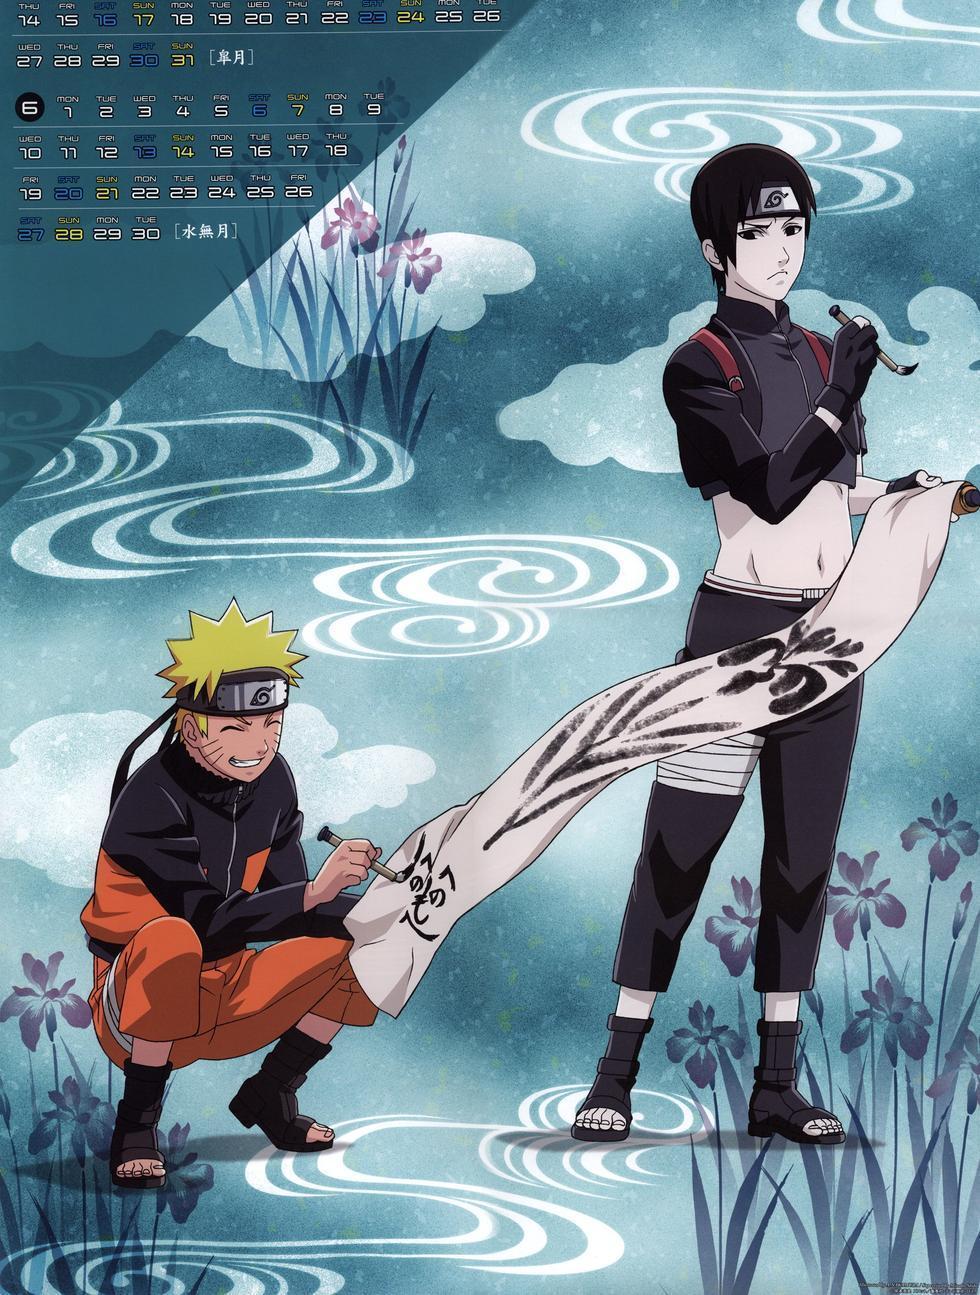 Naruto and Sai - Anime Guys Photo (18945546) - Fanpop